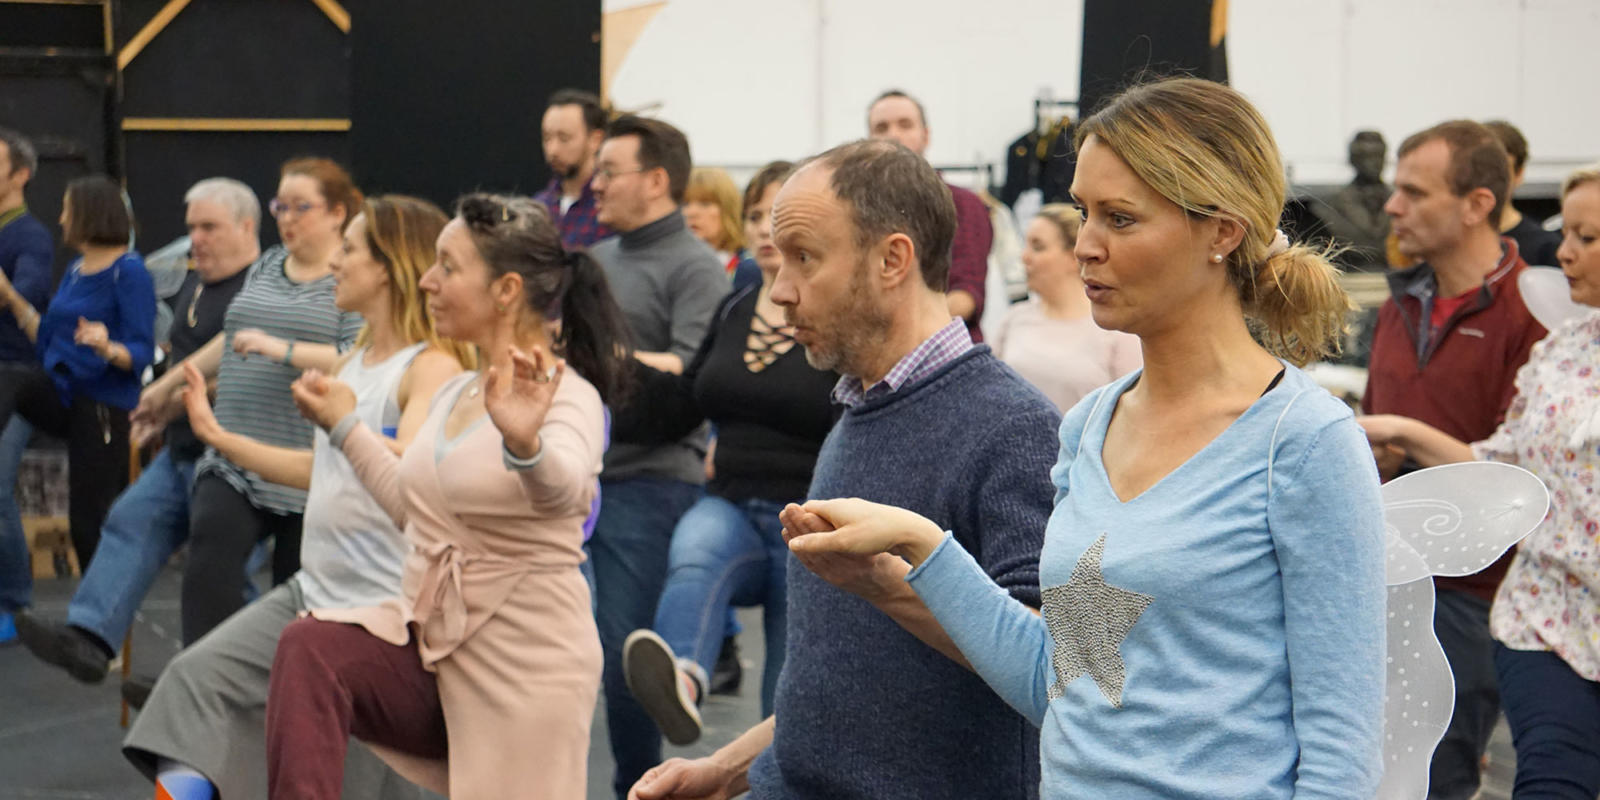 ENO Iolanthe: Flick Ferdinando and Joanne appleby dancing with members of the ENO chorus